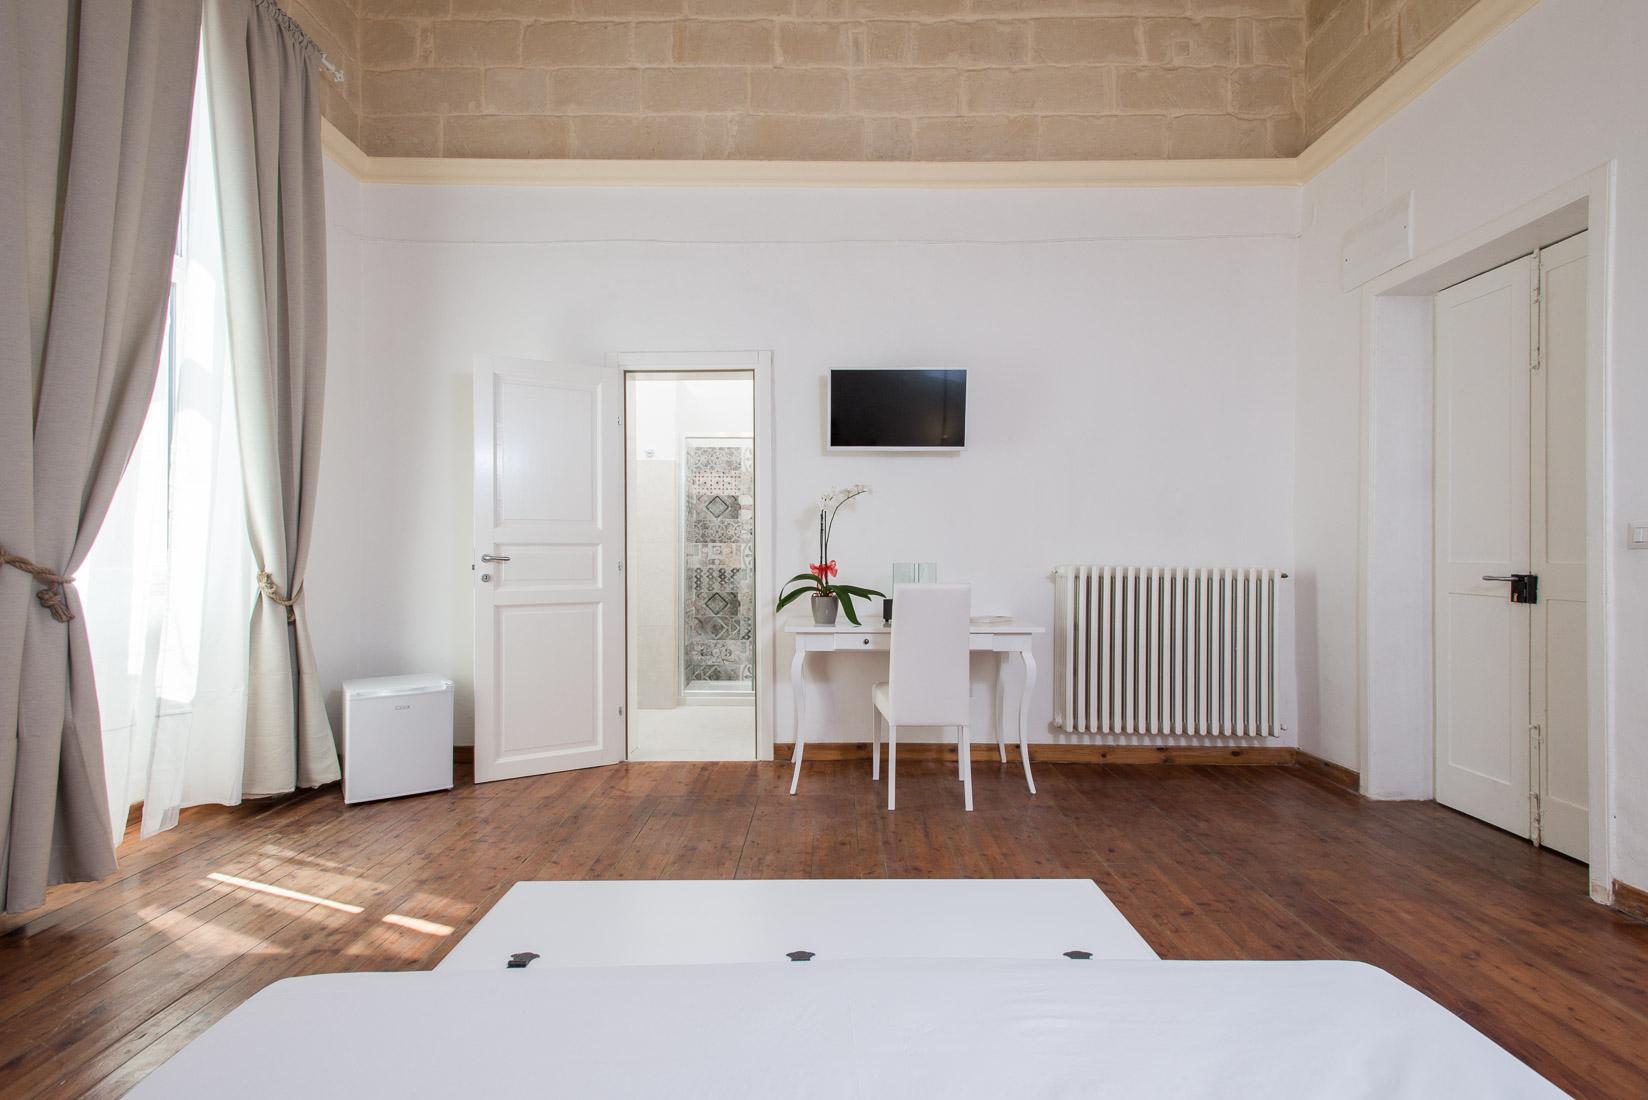 https://www.orlandinifrancesco.com/wp/wp-content/uploads/2019/01/Ada-Suite-Lecce-5.jpg